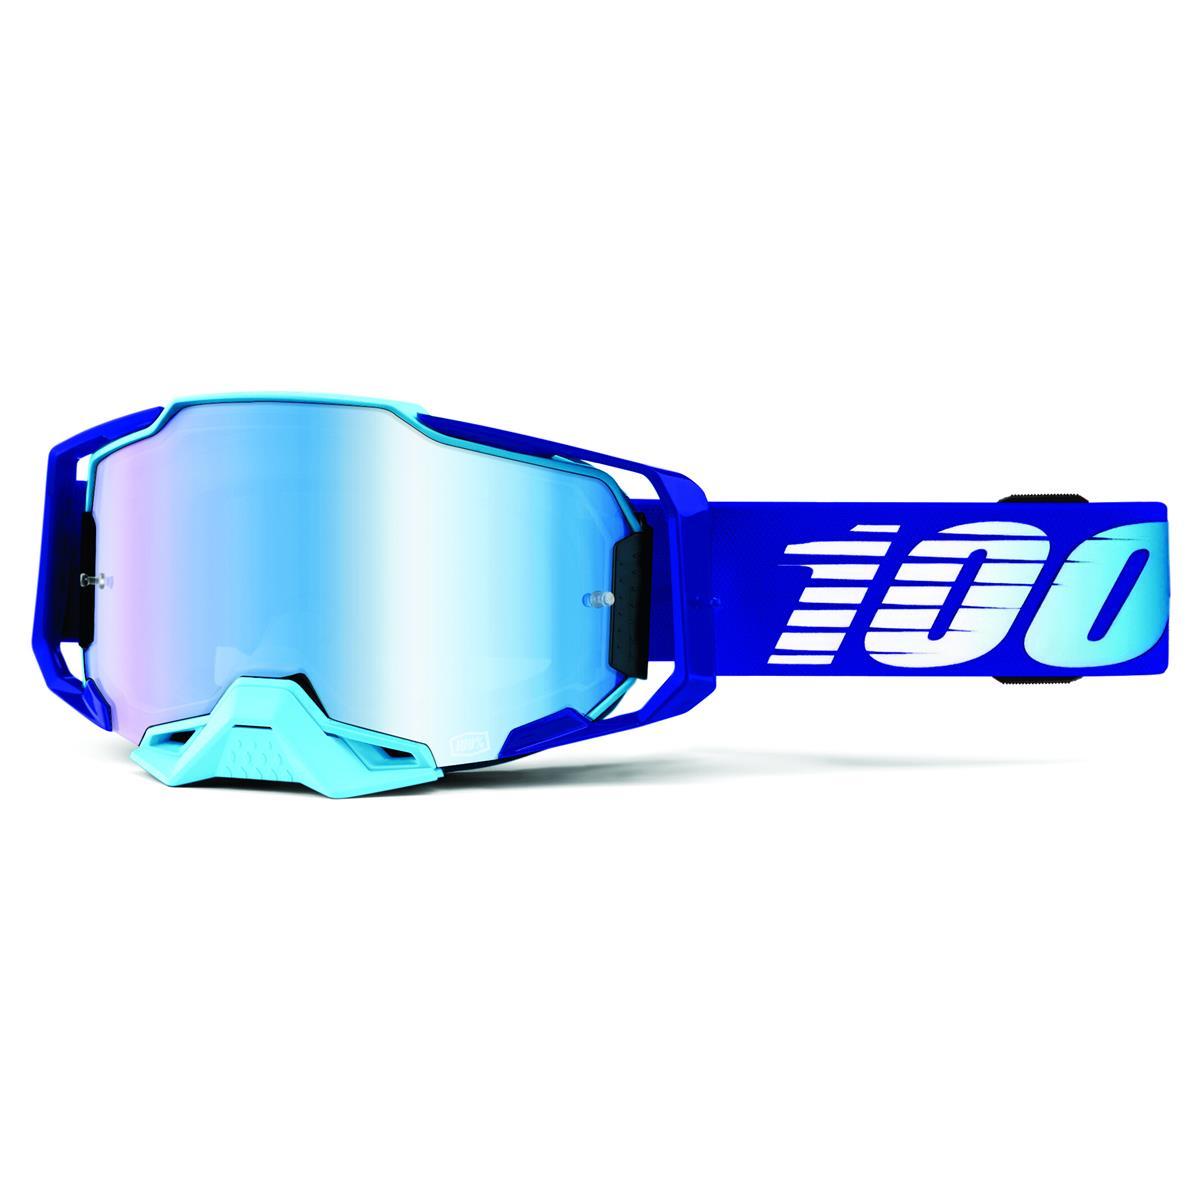 100% Crossbrille Armega Royal - verspiegelt, Anti Fog